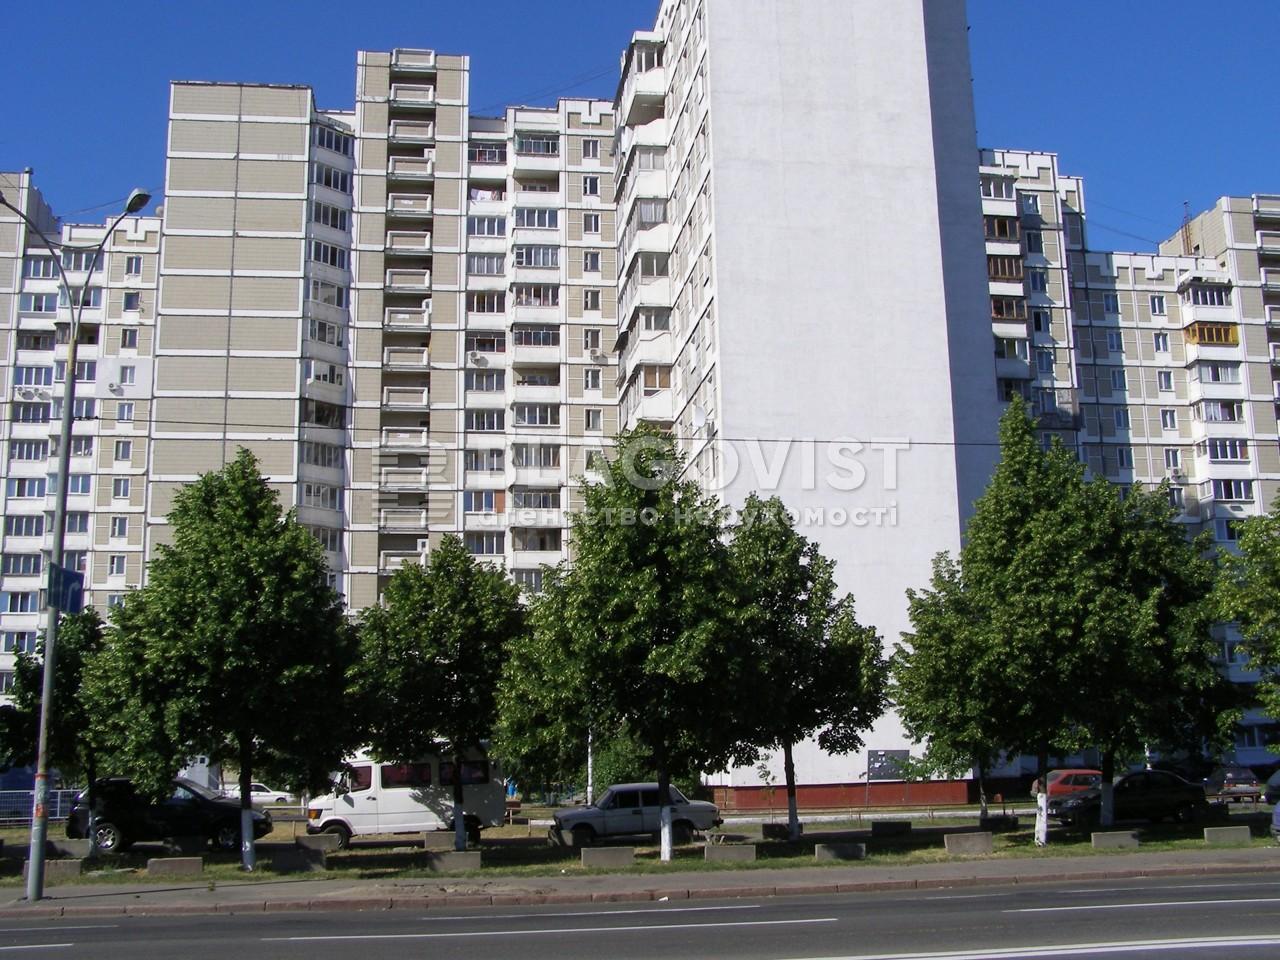 Квартира C-100268, Харьковское шоссе, 170, Киев - Фото 2